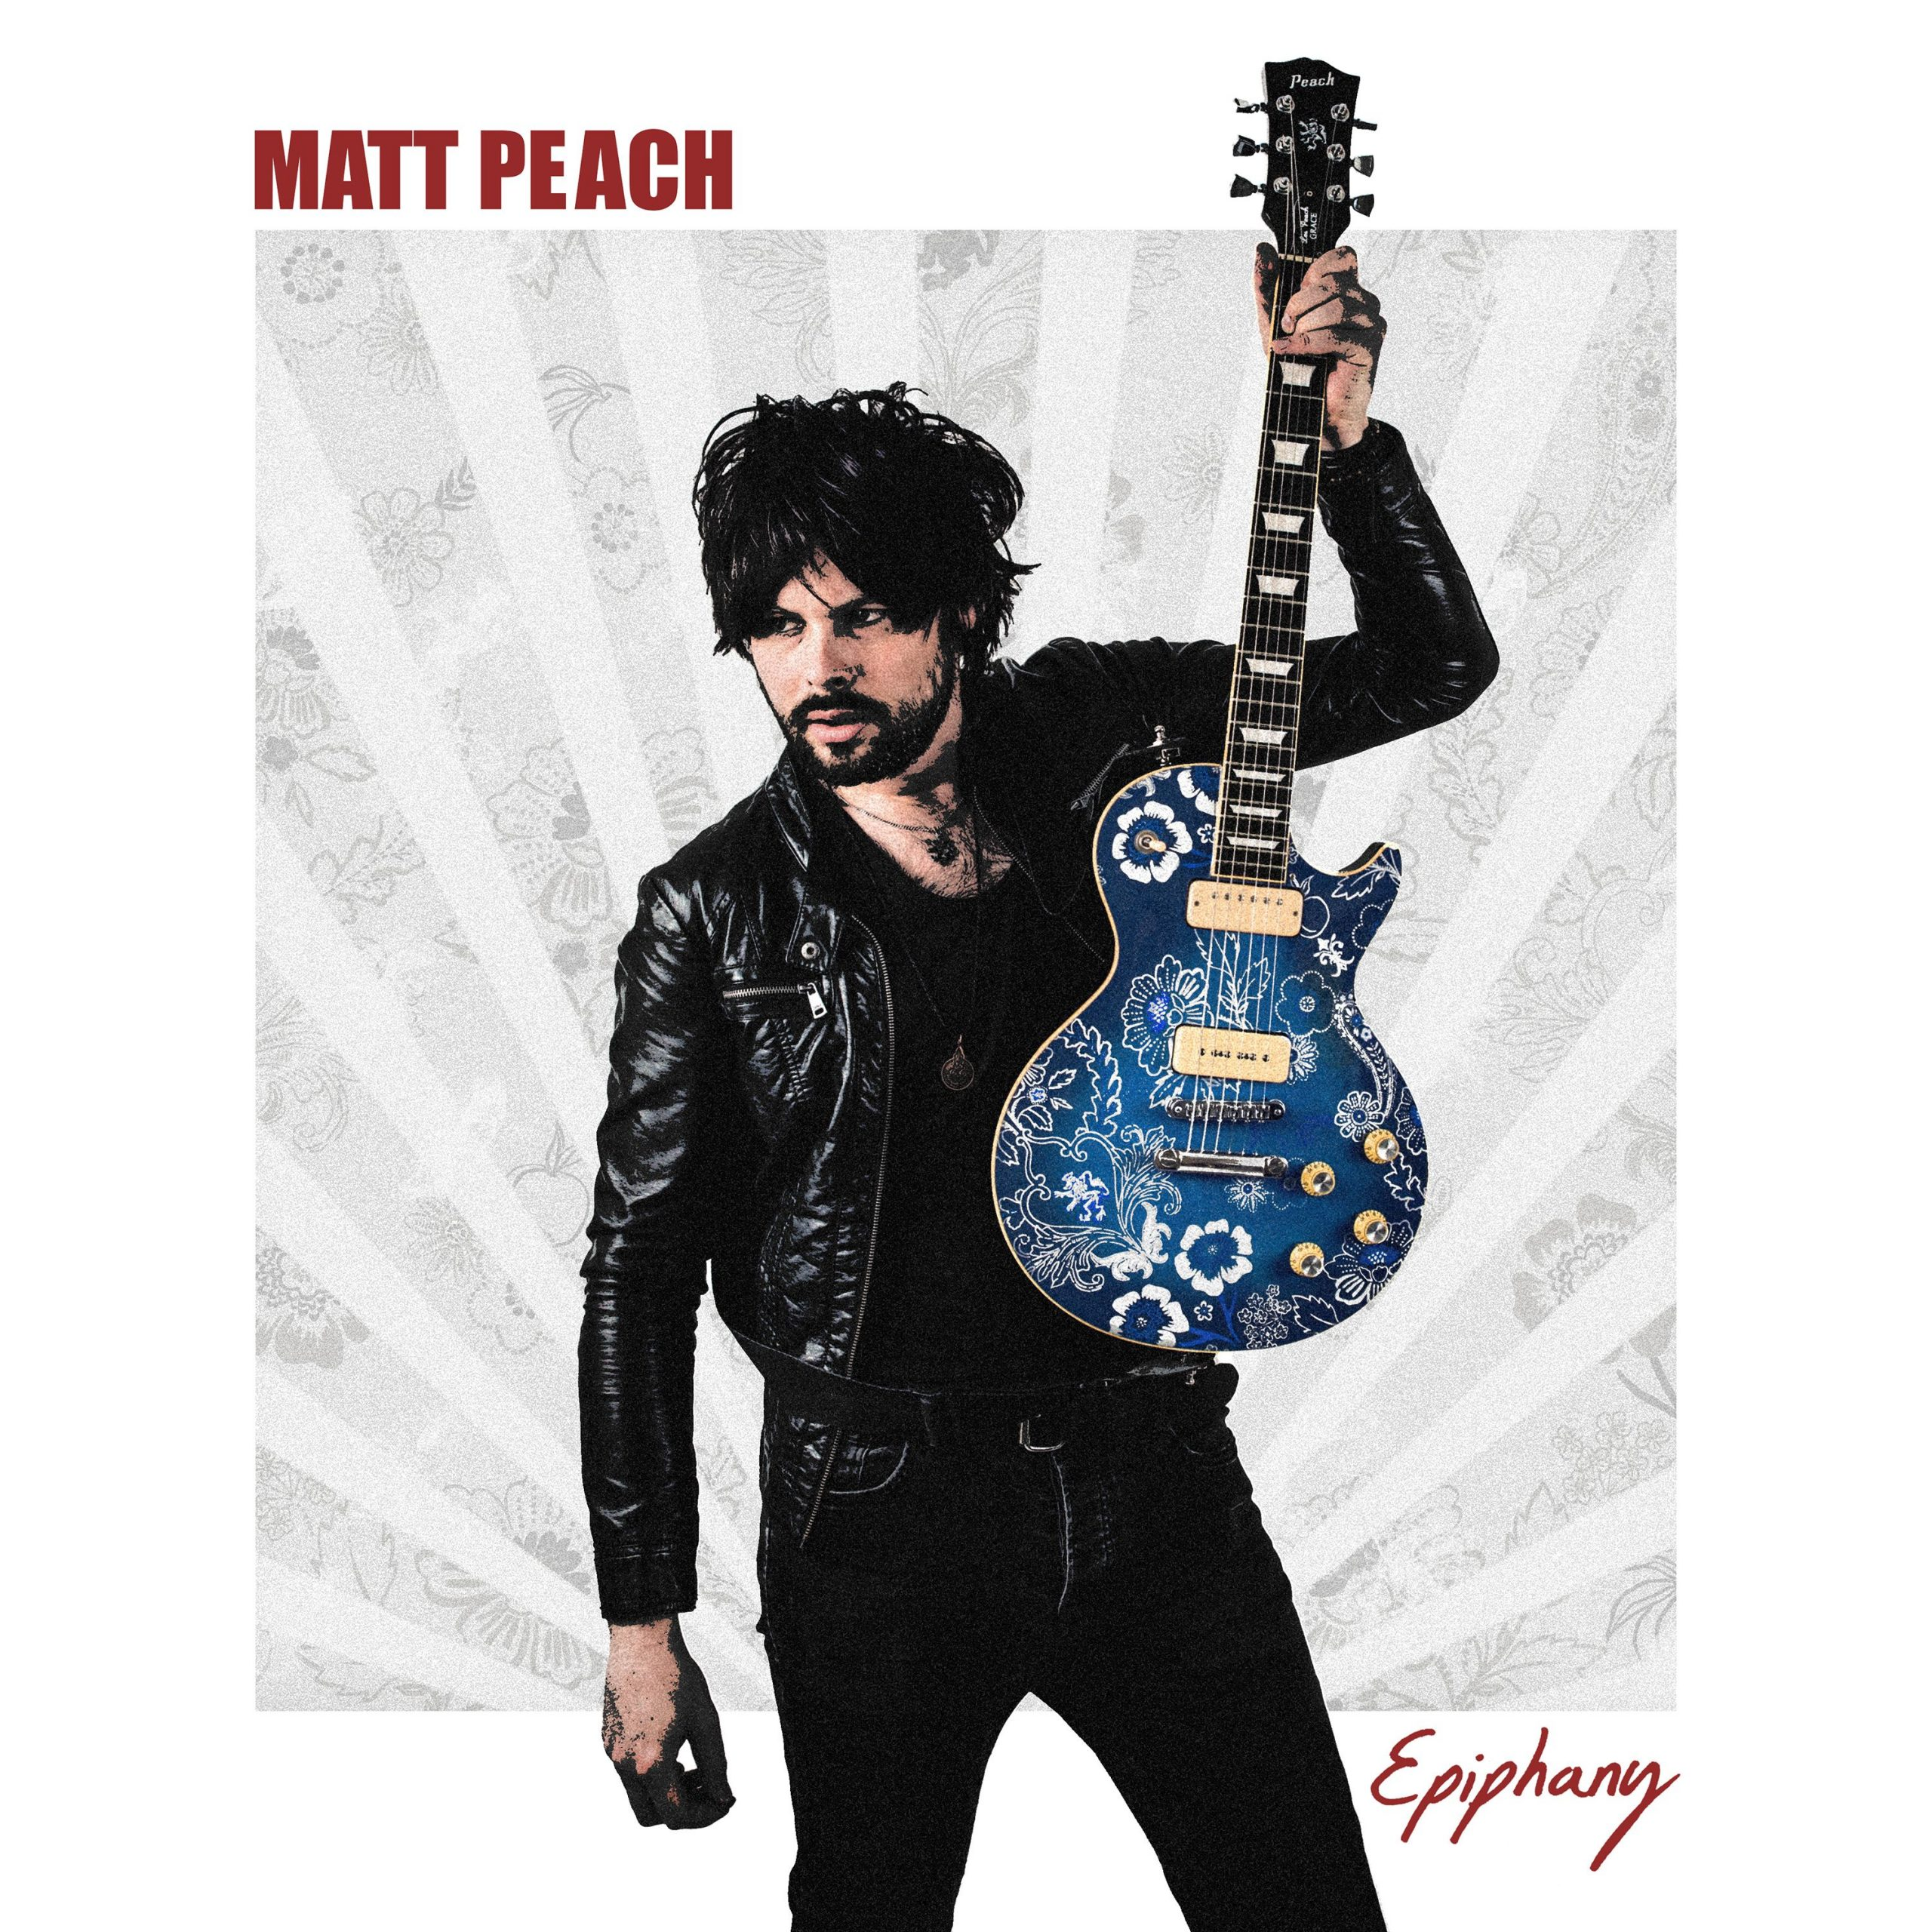 Matt Peach - Epiphany Review.